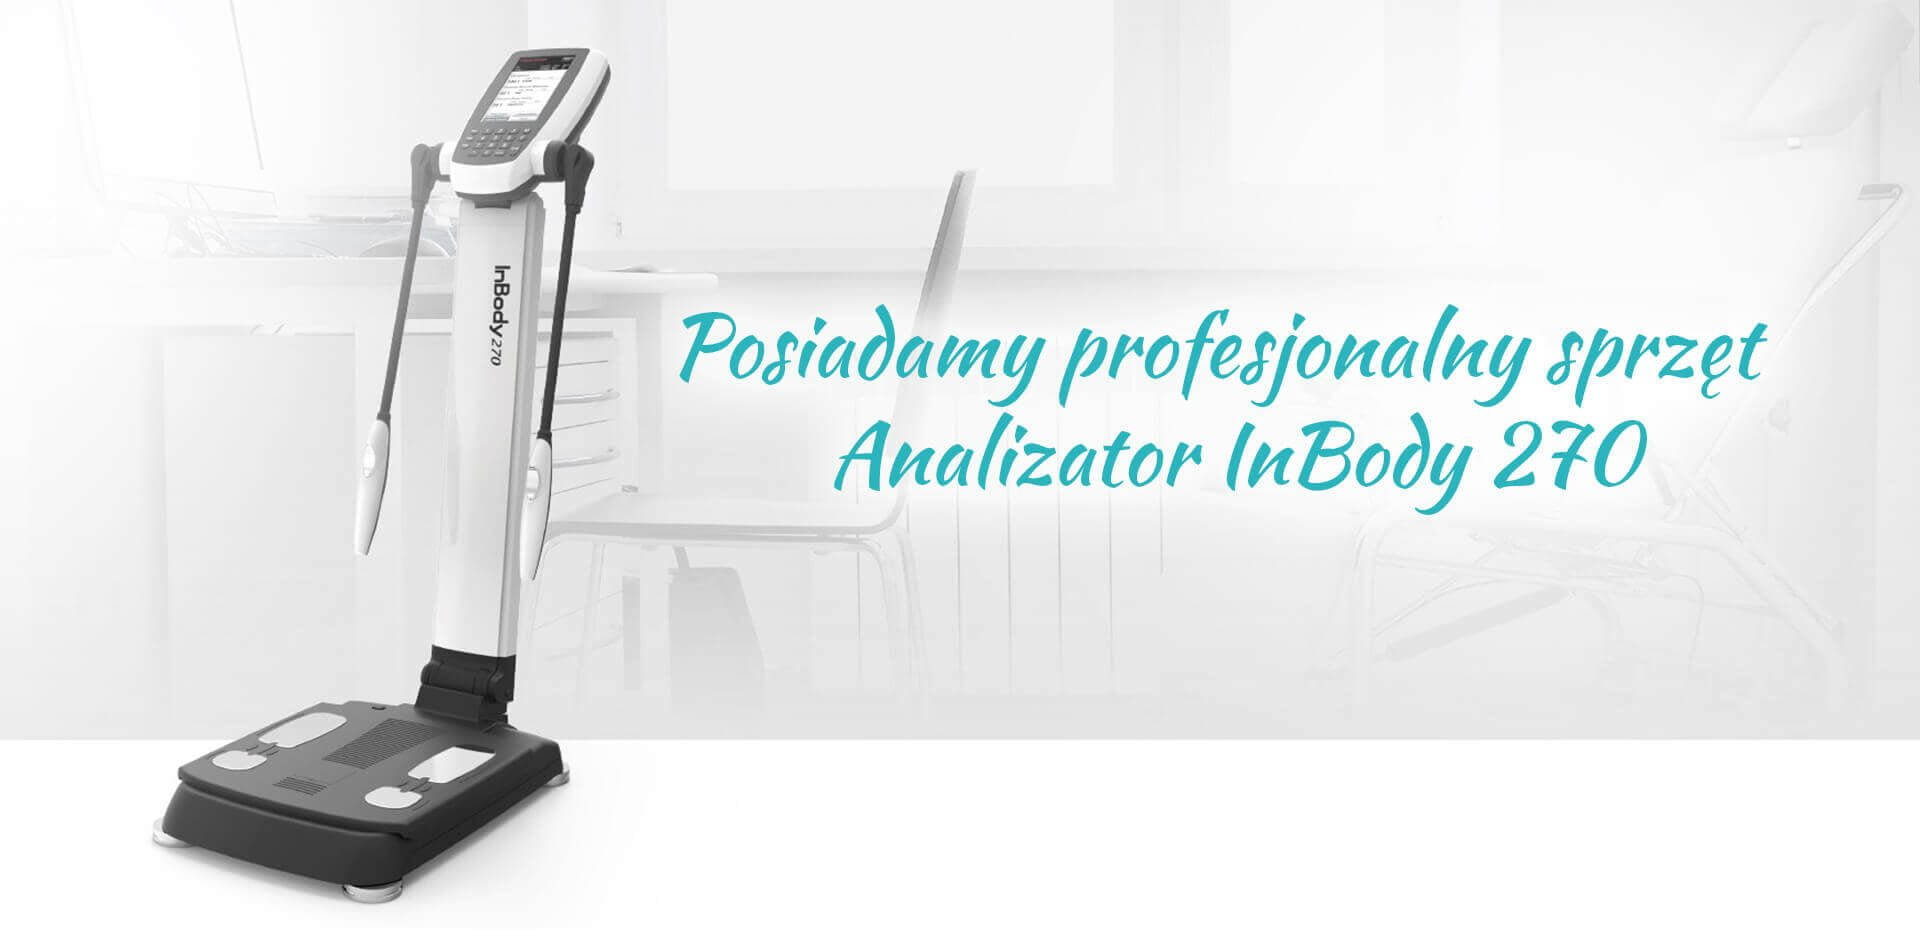 Anlizator InBody 270 1